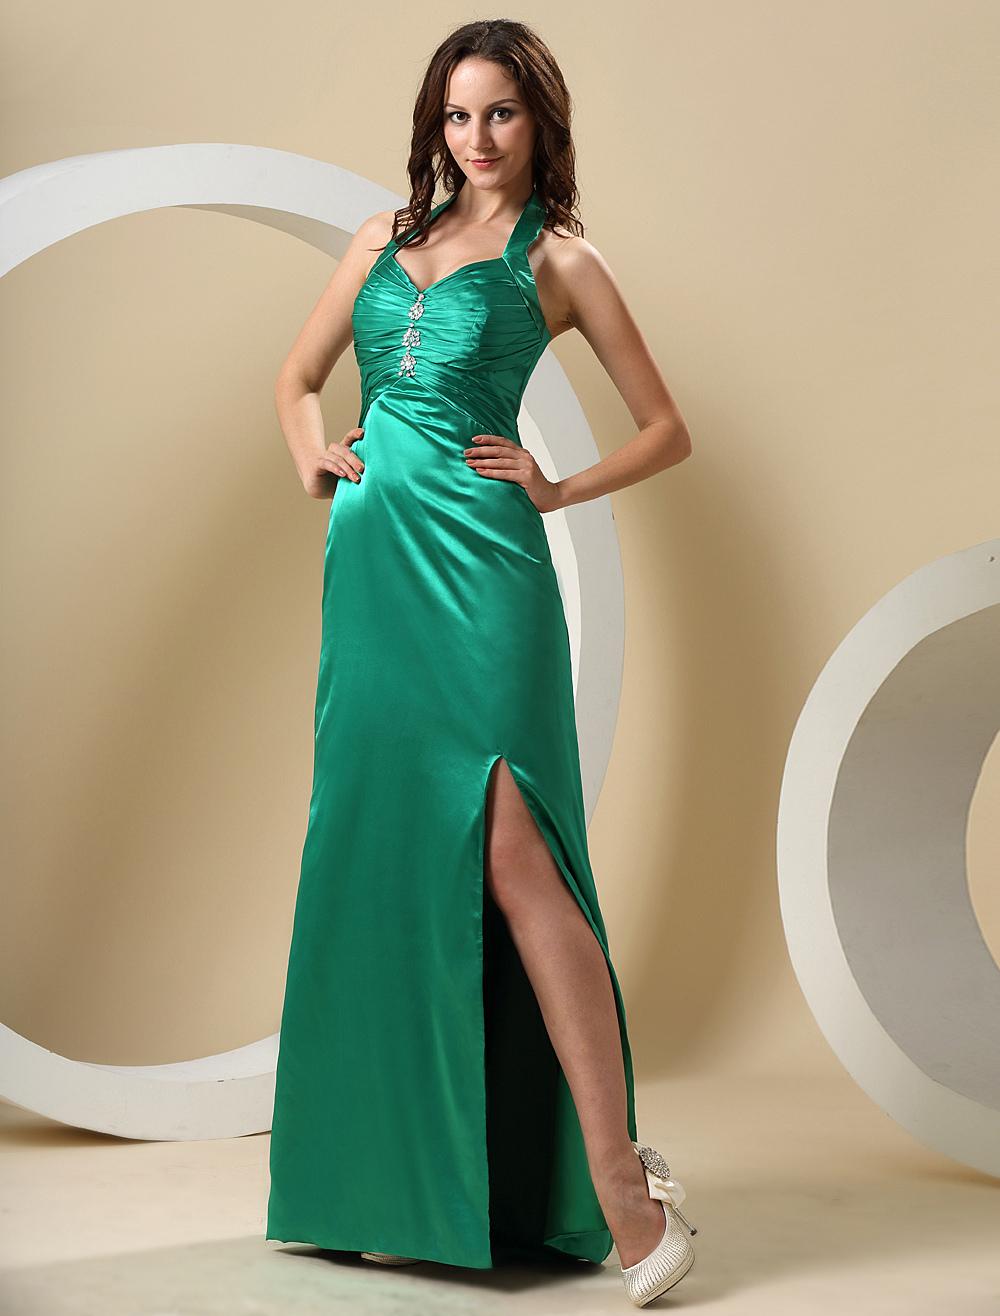 Hunter Green Halter Floor Length Elastic Woven Satin Prom Dress (Wedding Prom Dresses) photo